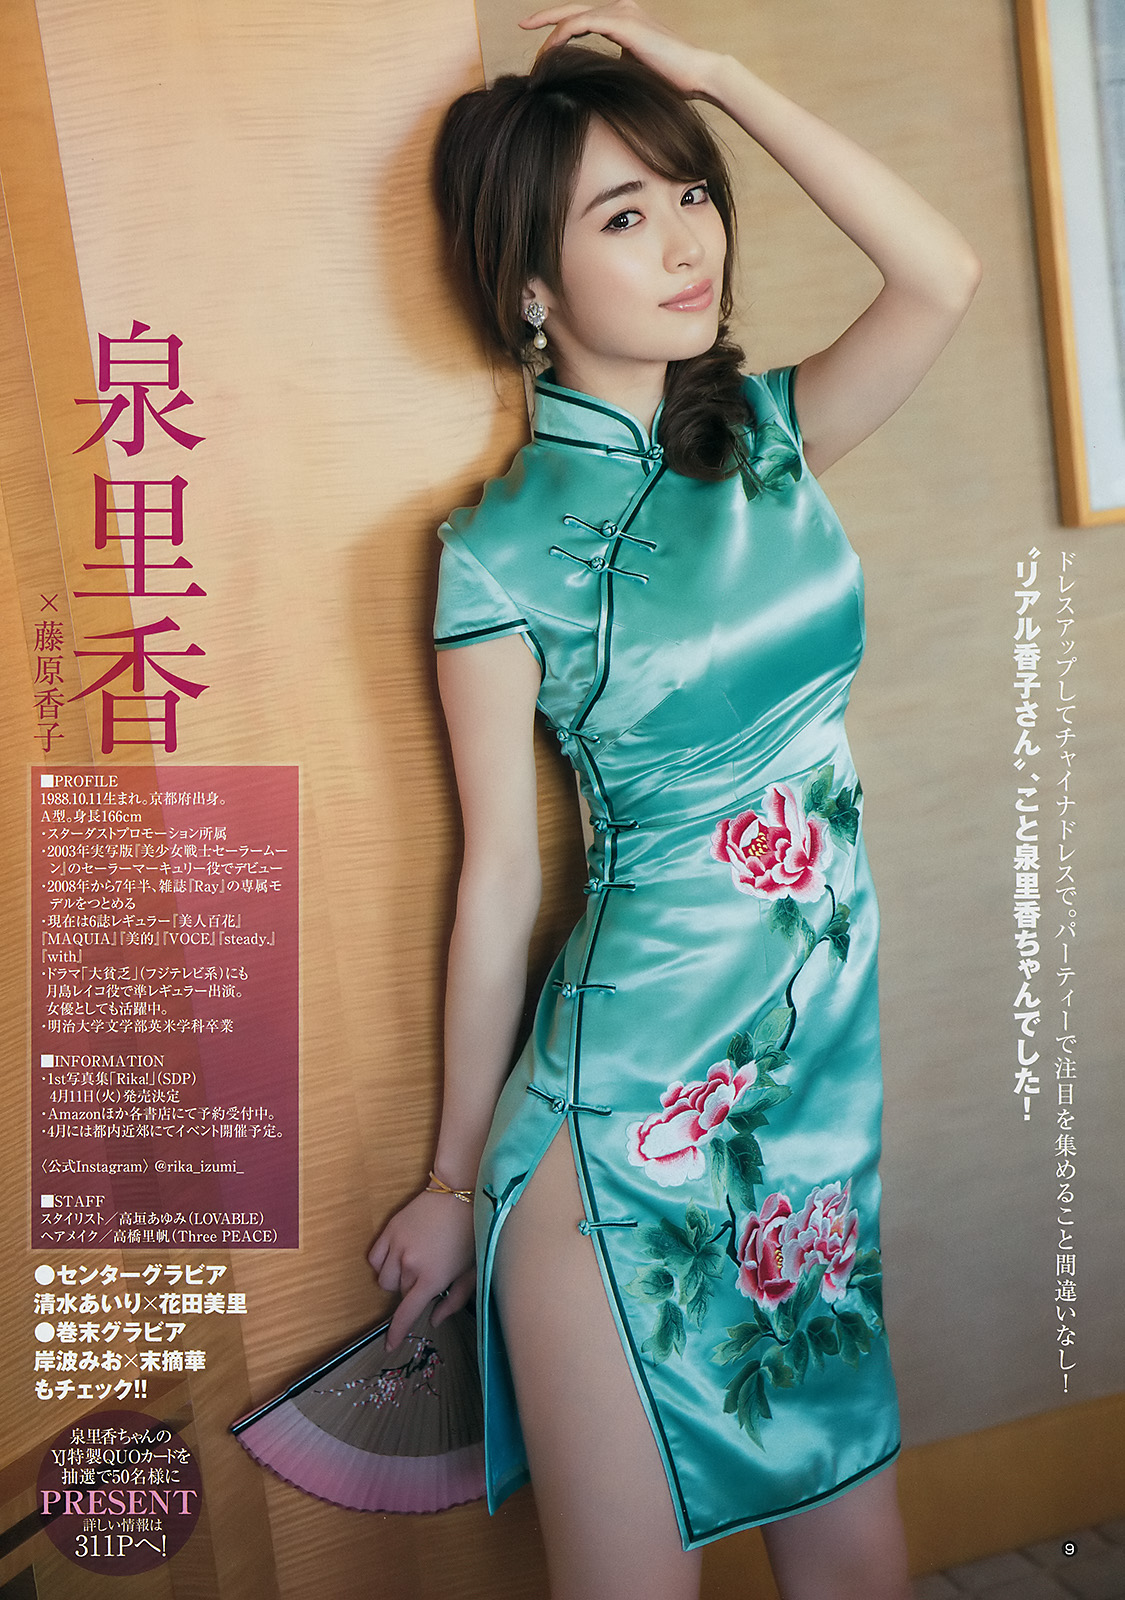 Nao Kanzaki and a few friends: Rika Izumi: Her intro post